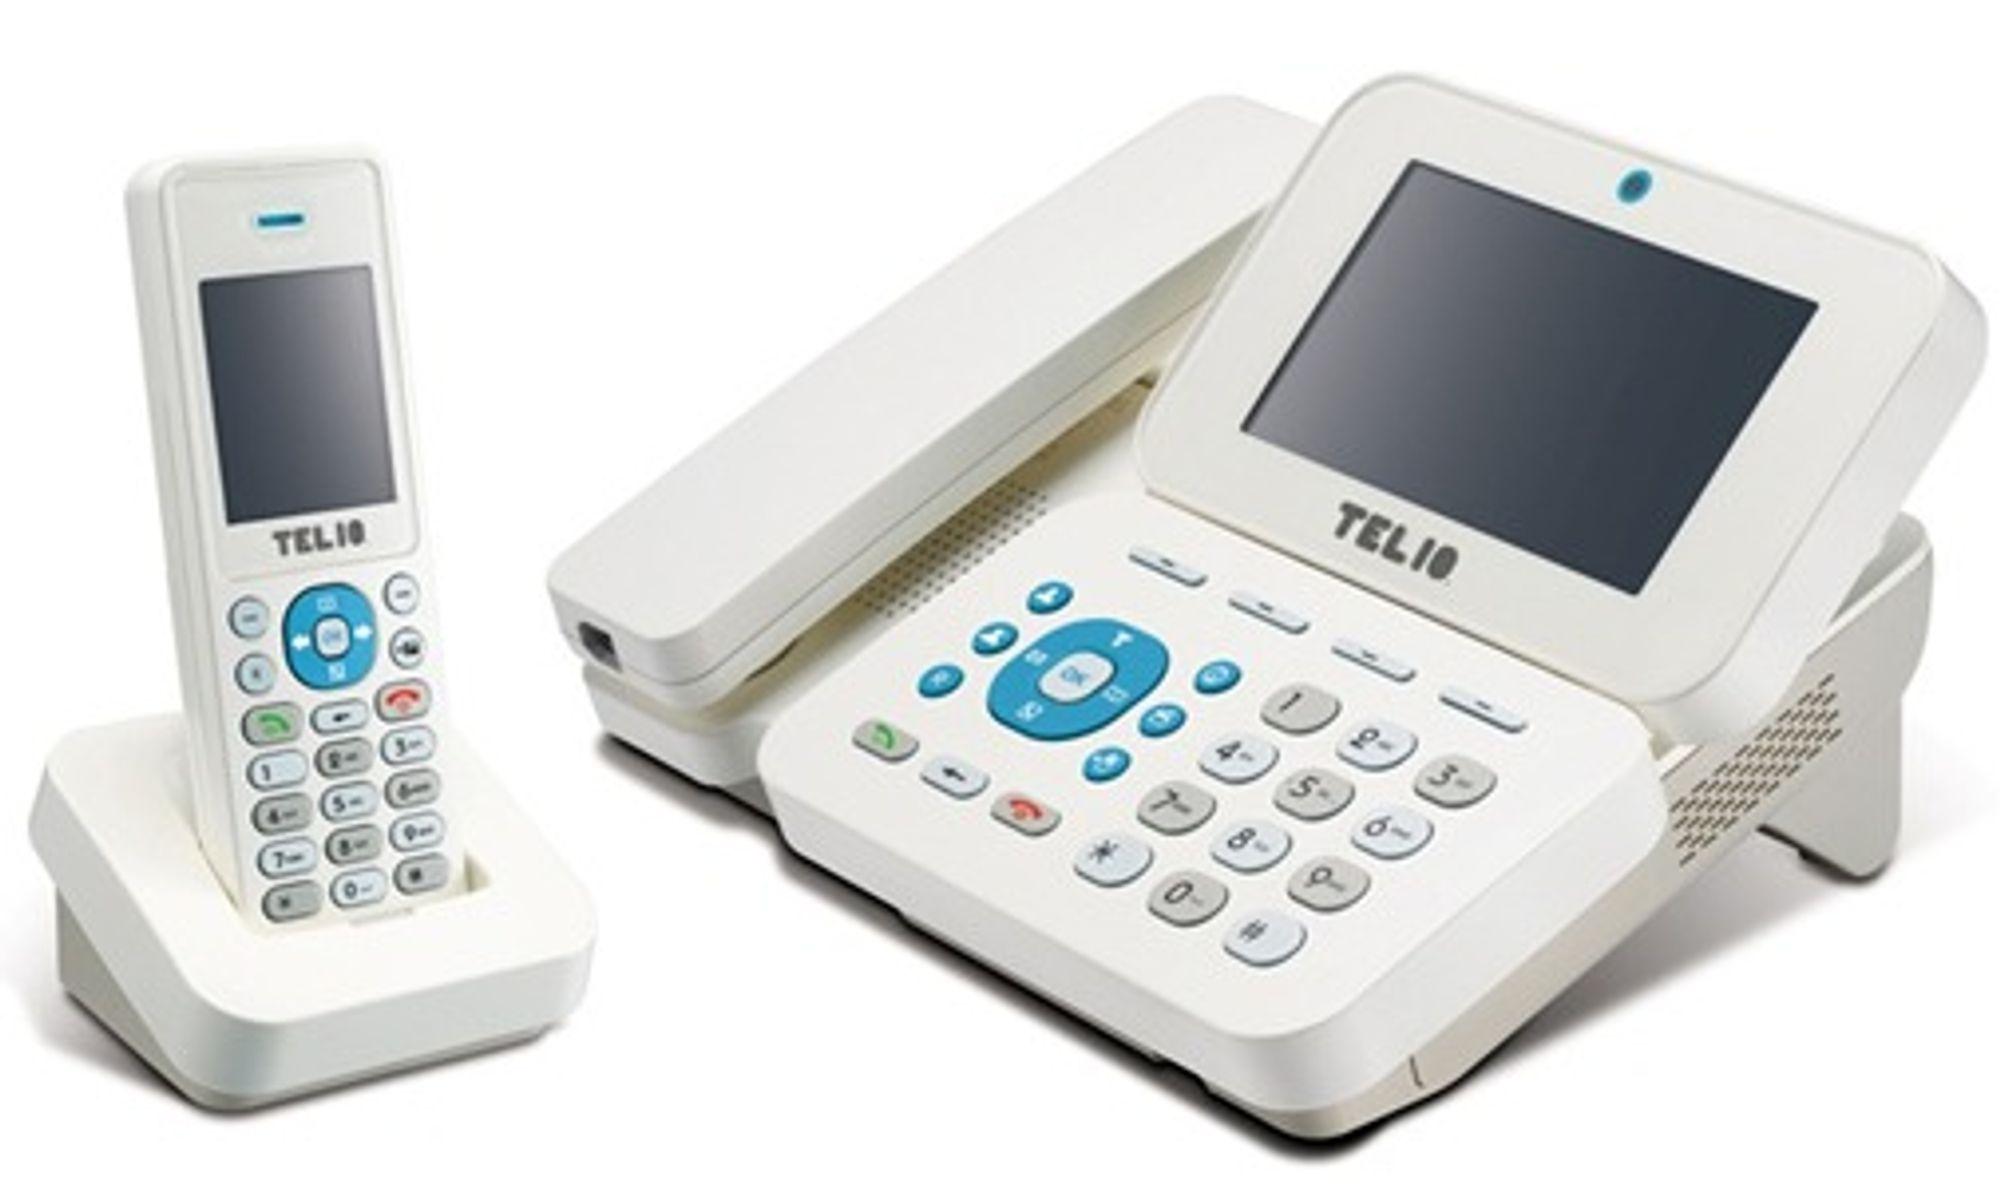 Telios videotelefon er samtidig en base for opptil tre trådløse DECT-apparater.